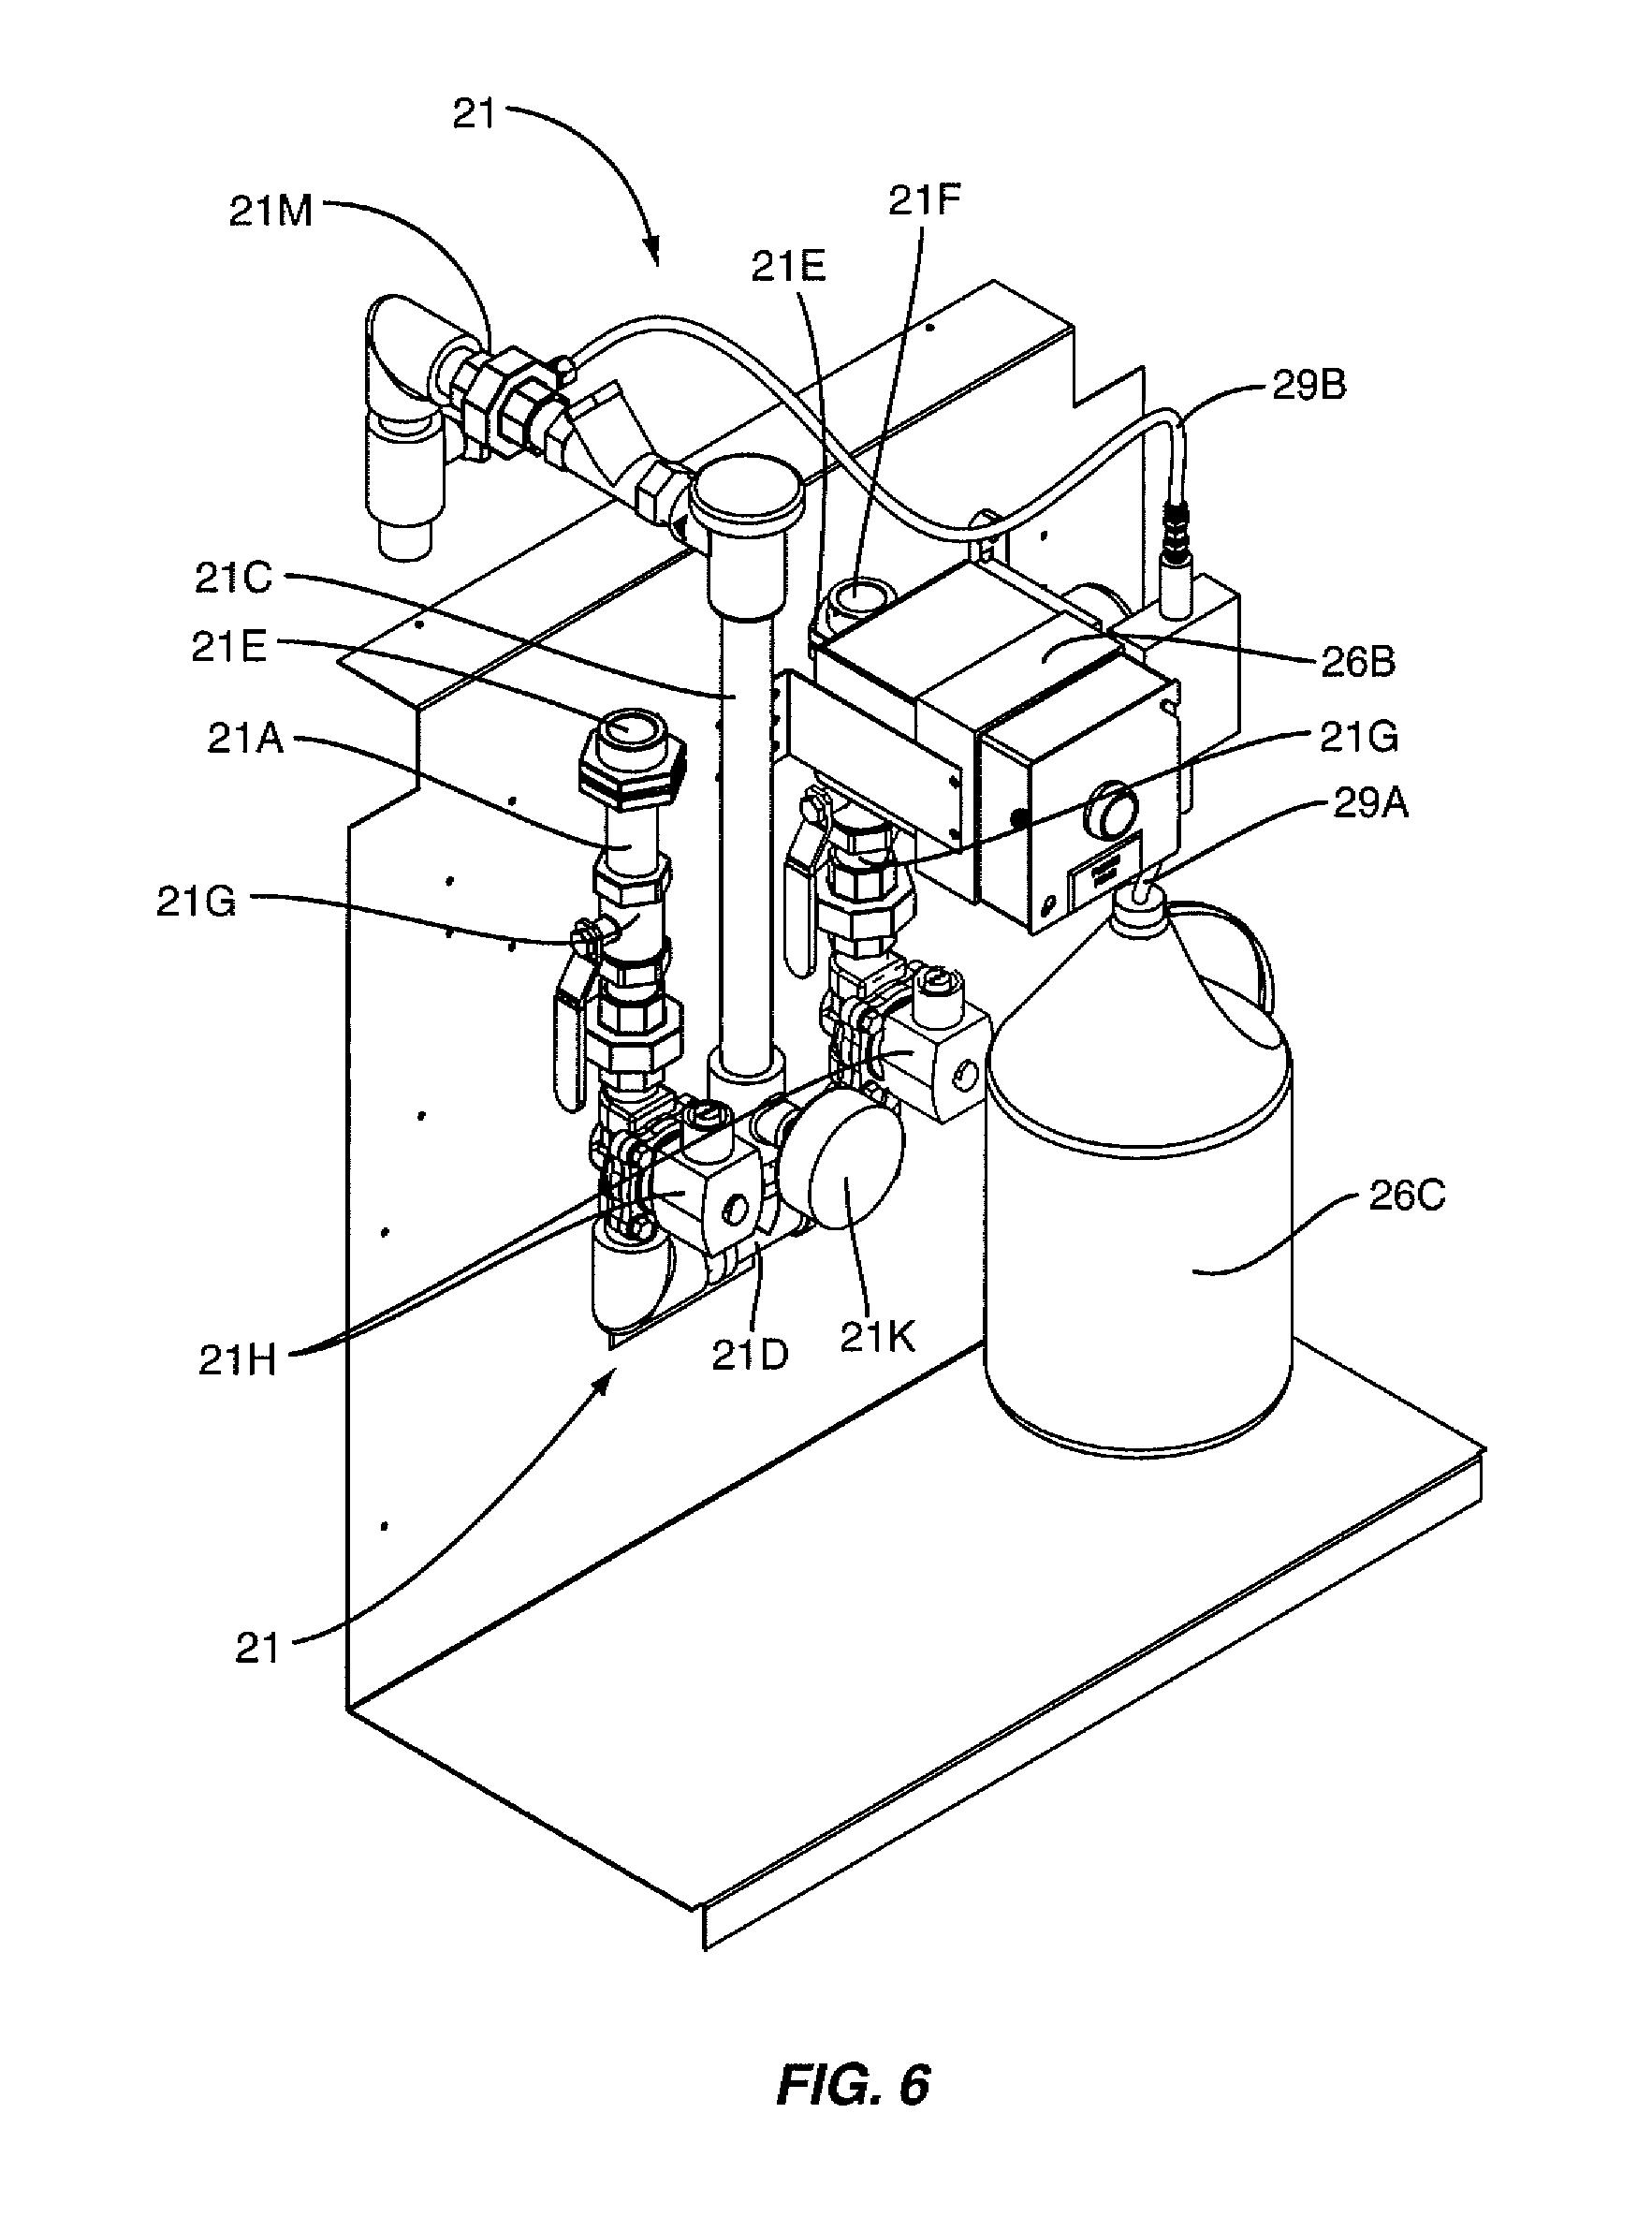 US08378834 20130219 D00007?resize=665%2C898 ansul automan wiring diagram ansul schematics, mac valve 9 pin ansul system wiring schematic at bakdesigns.co